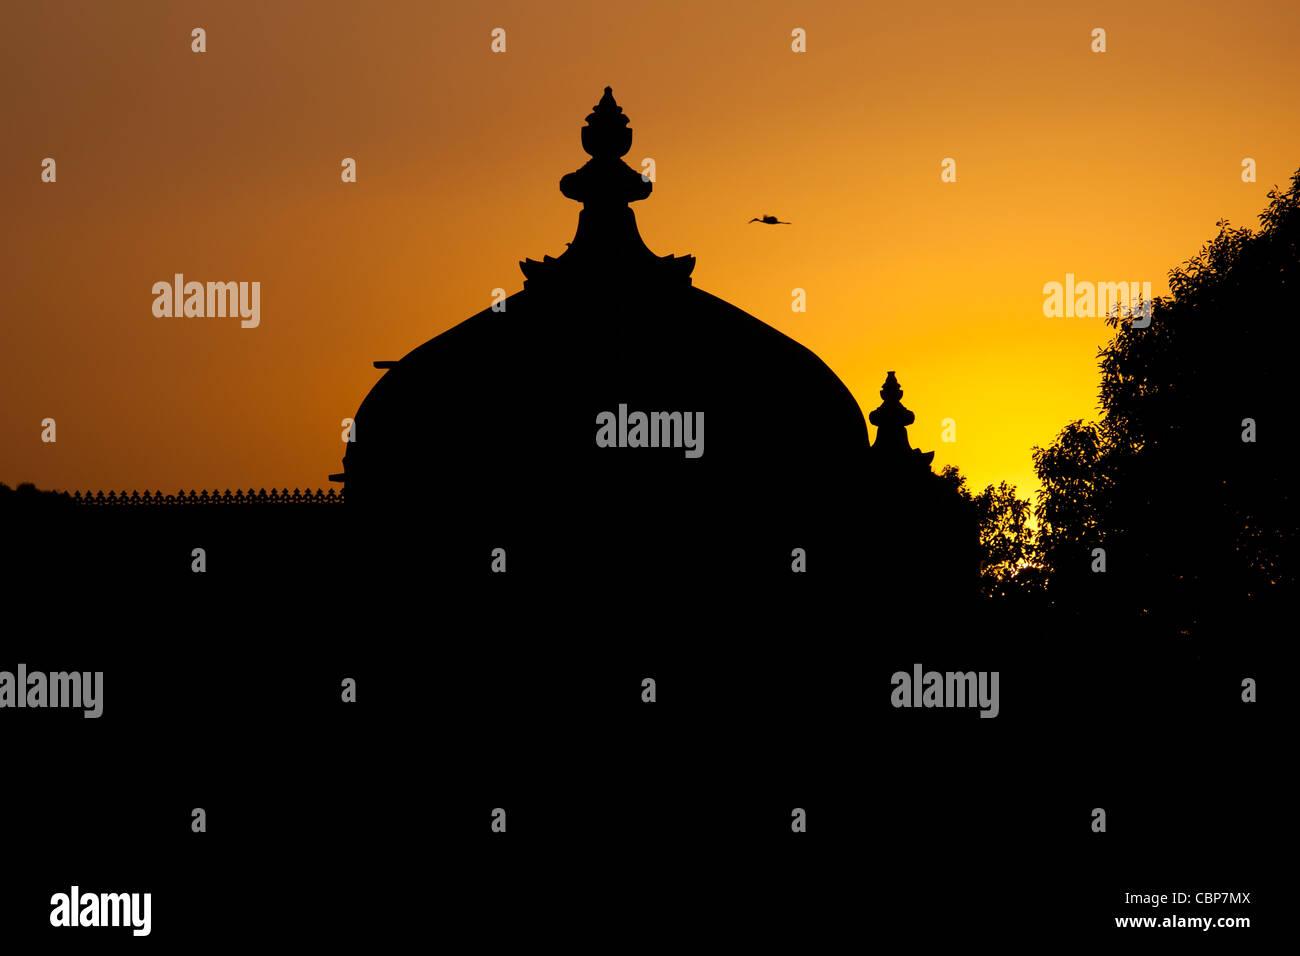 Gol Mahal Raj Angan Nebengebäude, das Stadtschloss bei Sonnenuntergang in Udaipur, Rajasthan, Indien Stockbild